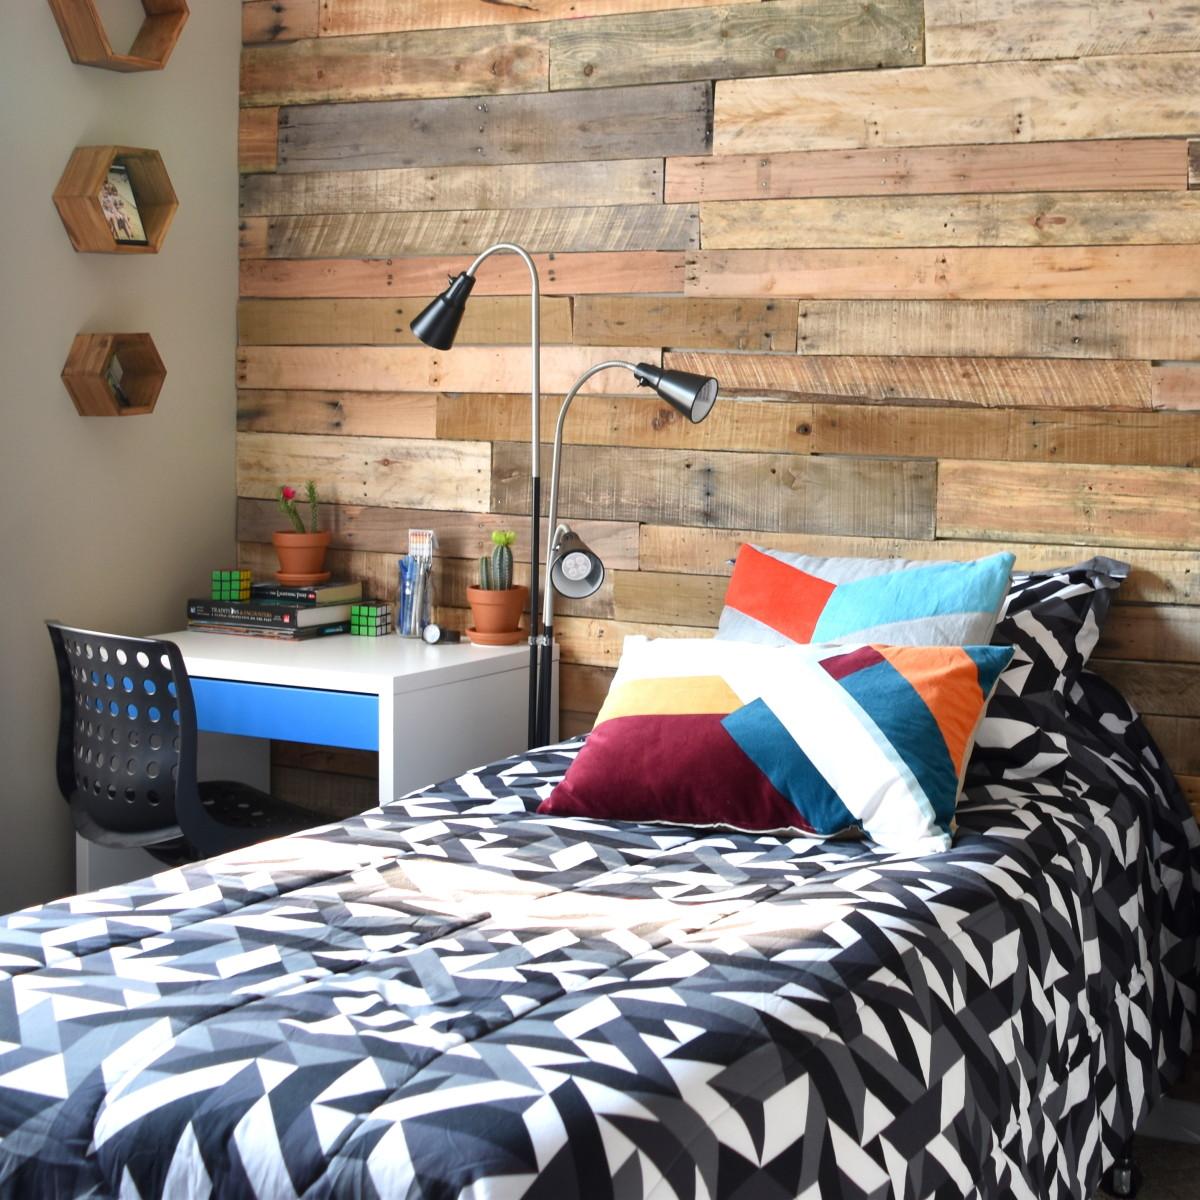 Modern, Rustic Teen Room + DIY Pallet Wall Tutorial ... on Small Room Pallet Bedroom Ideas  id=57668